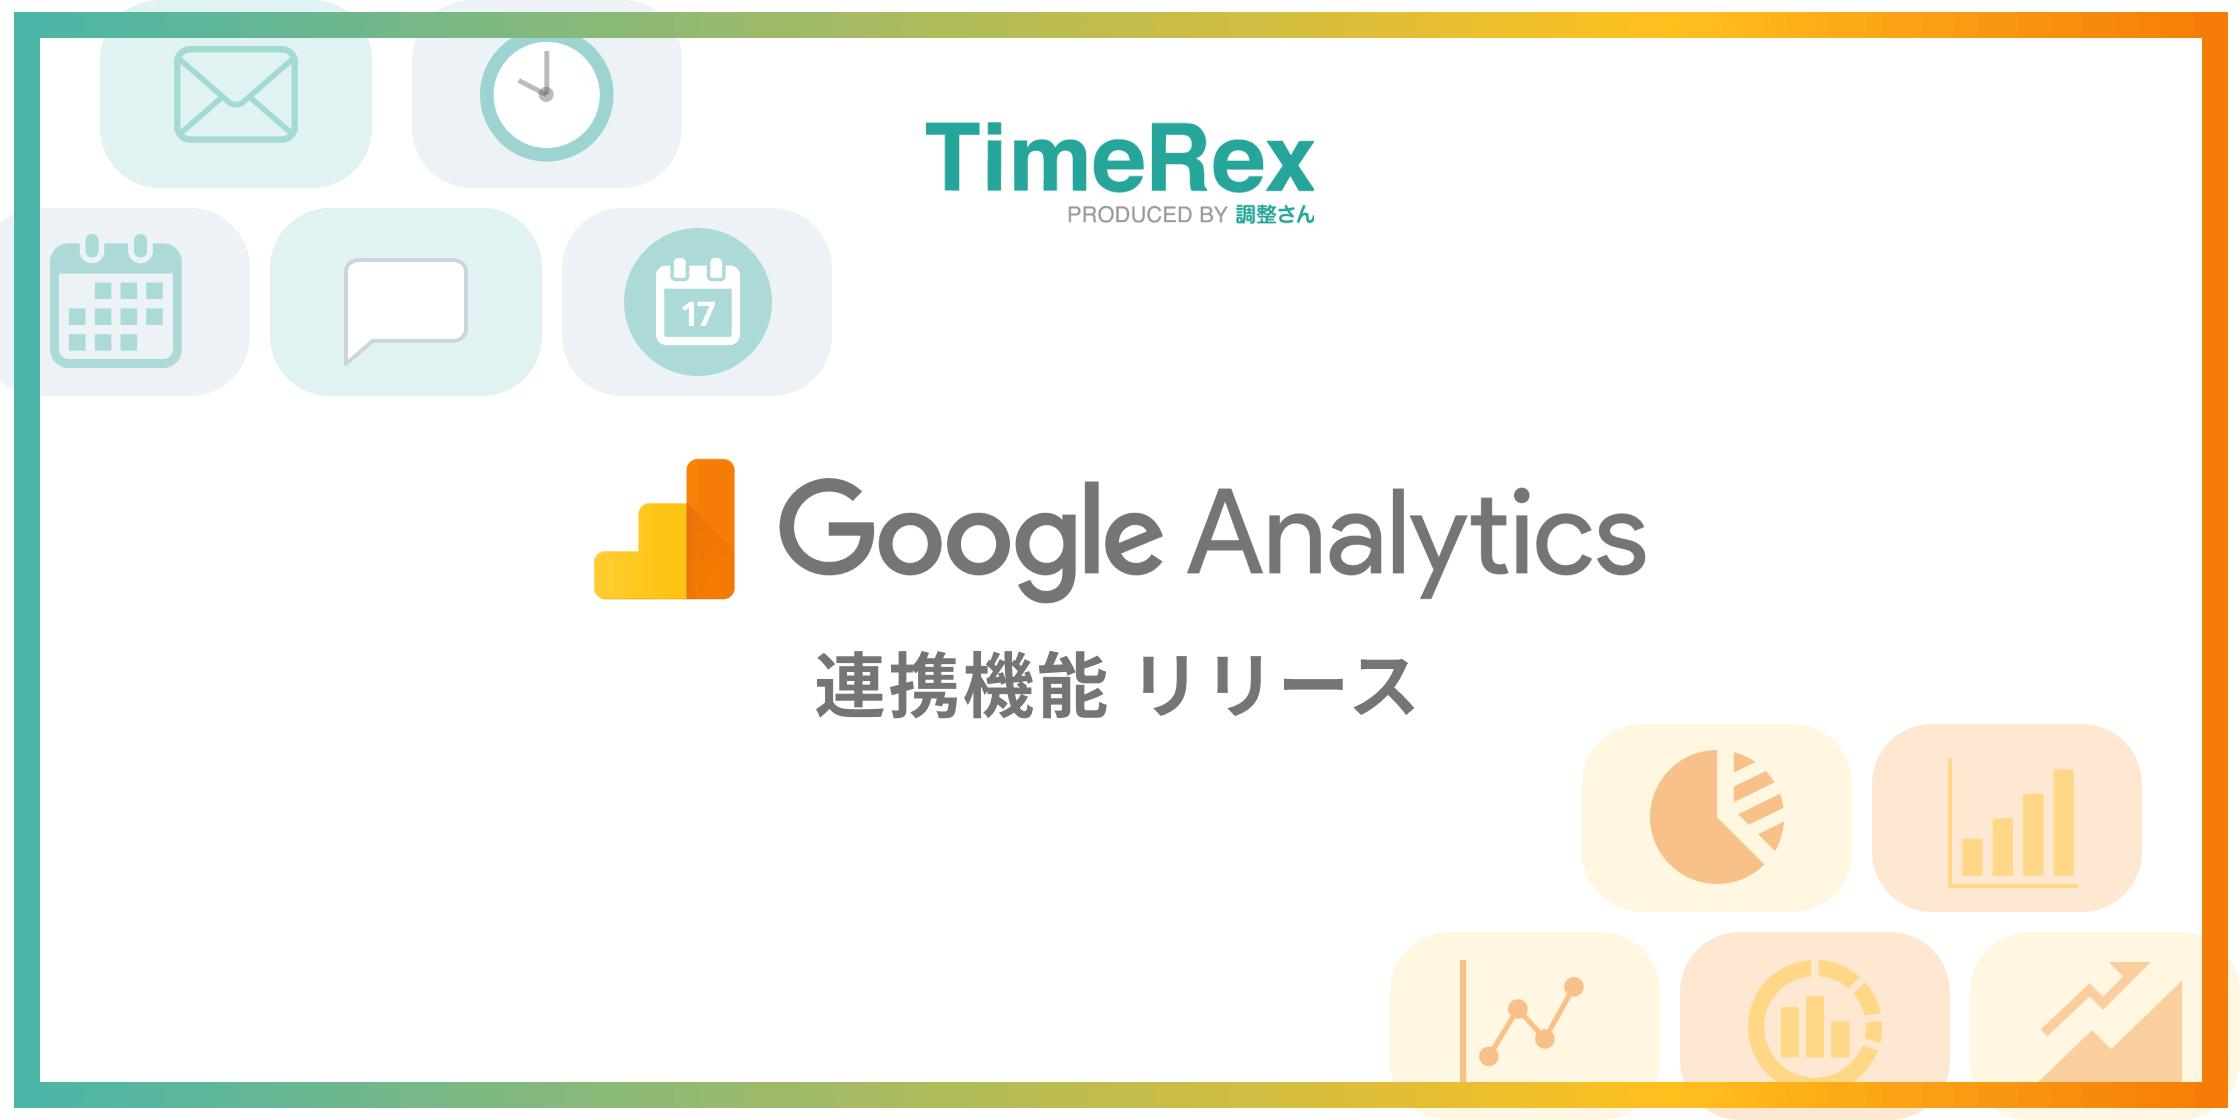 Google Analytics連携機能をリリースしました